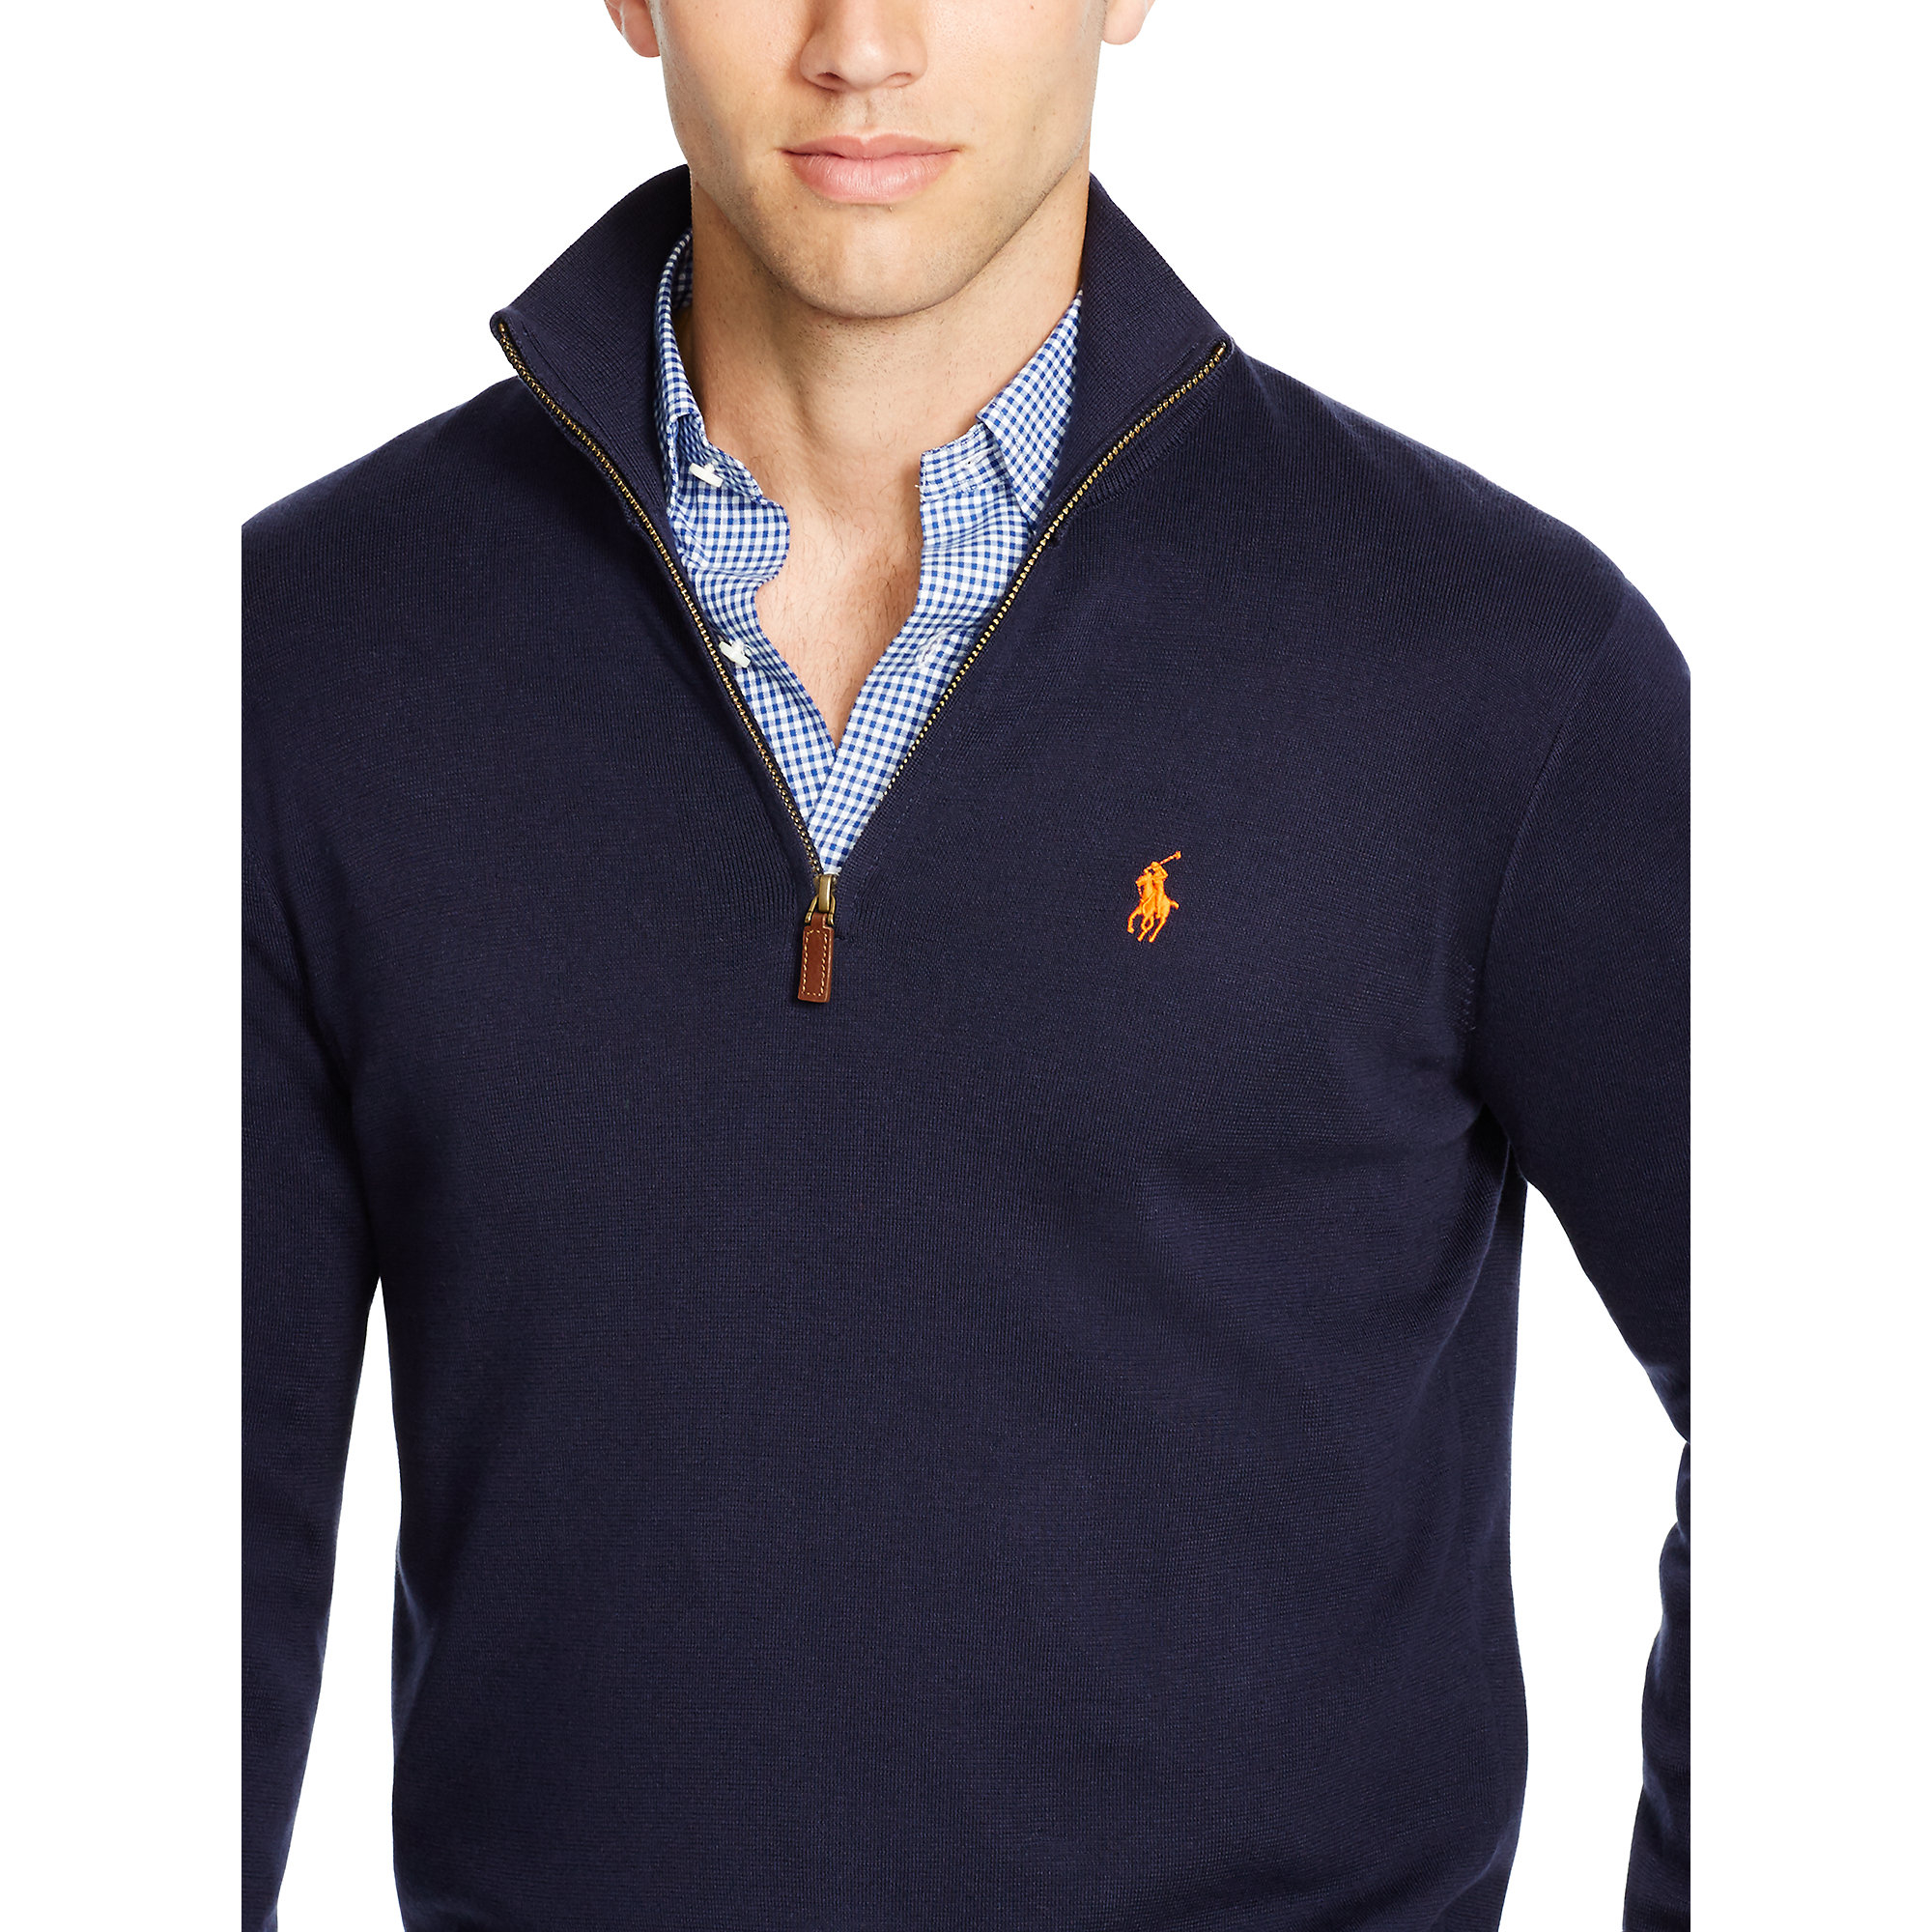 e442d6ef7 Polo Ralph Lauren Pima Cotton Half-zip Sweater in Blue for Men - Lyst